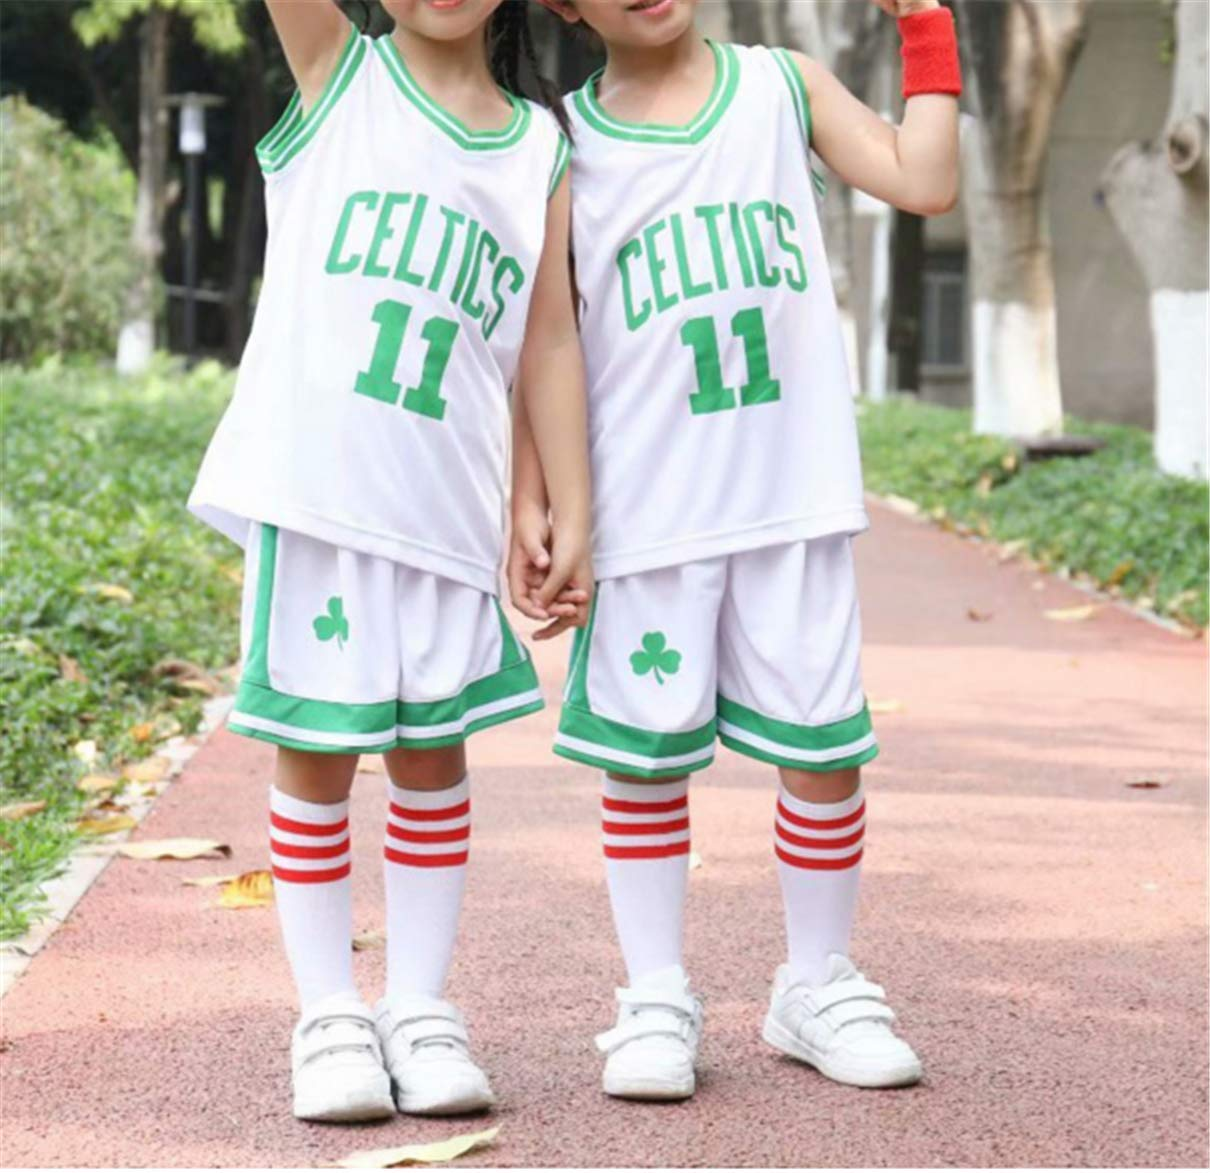 childrens jerseys